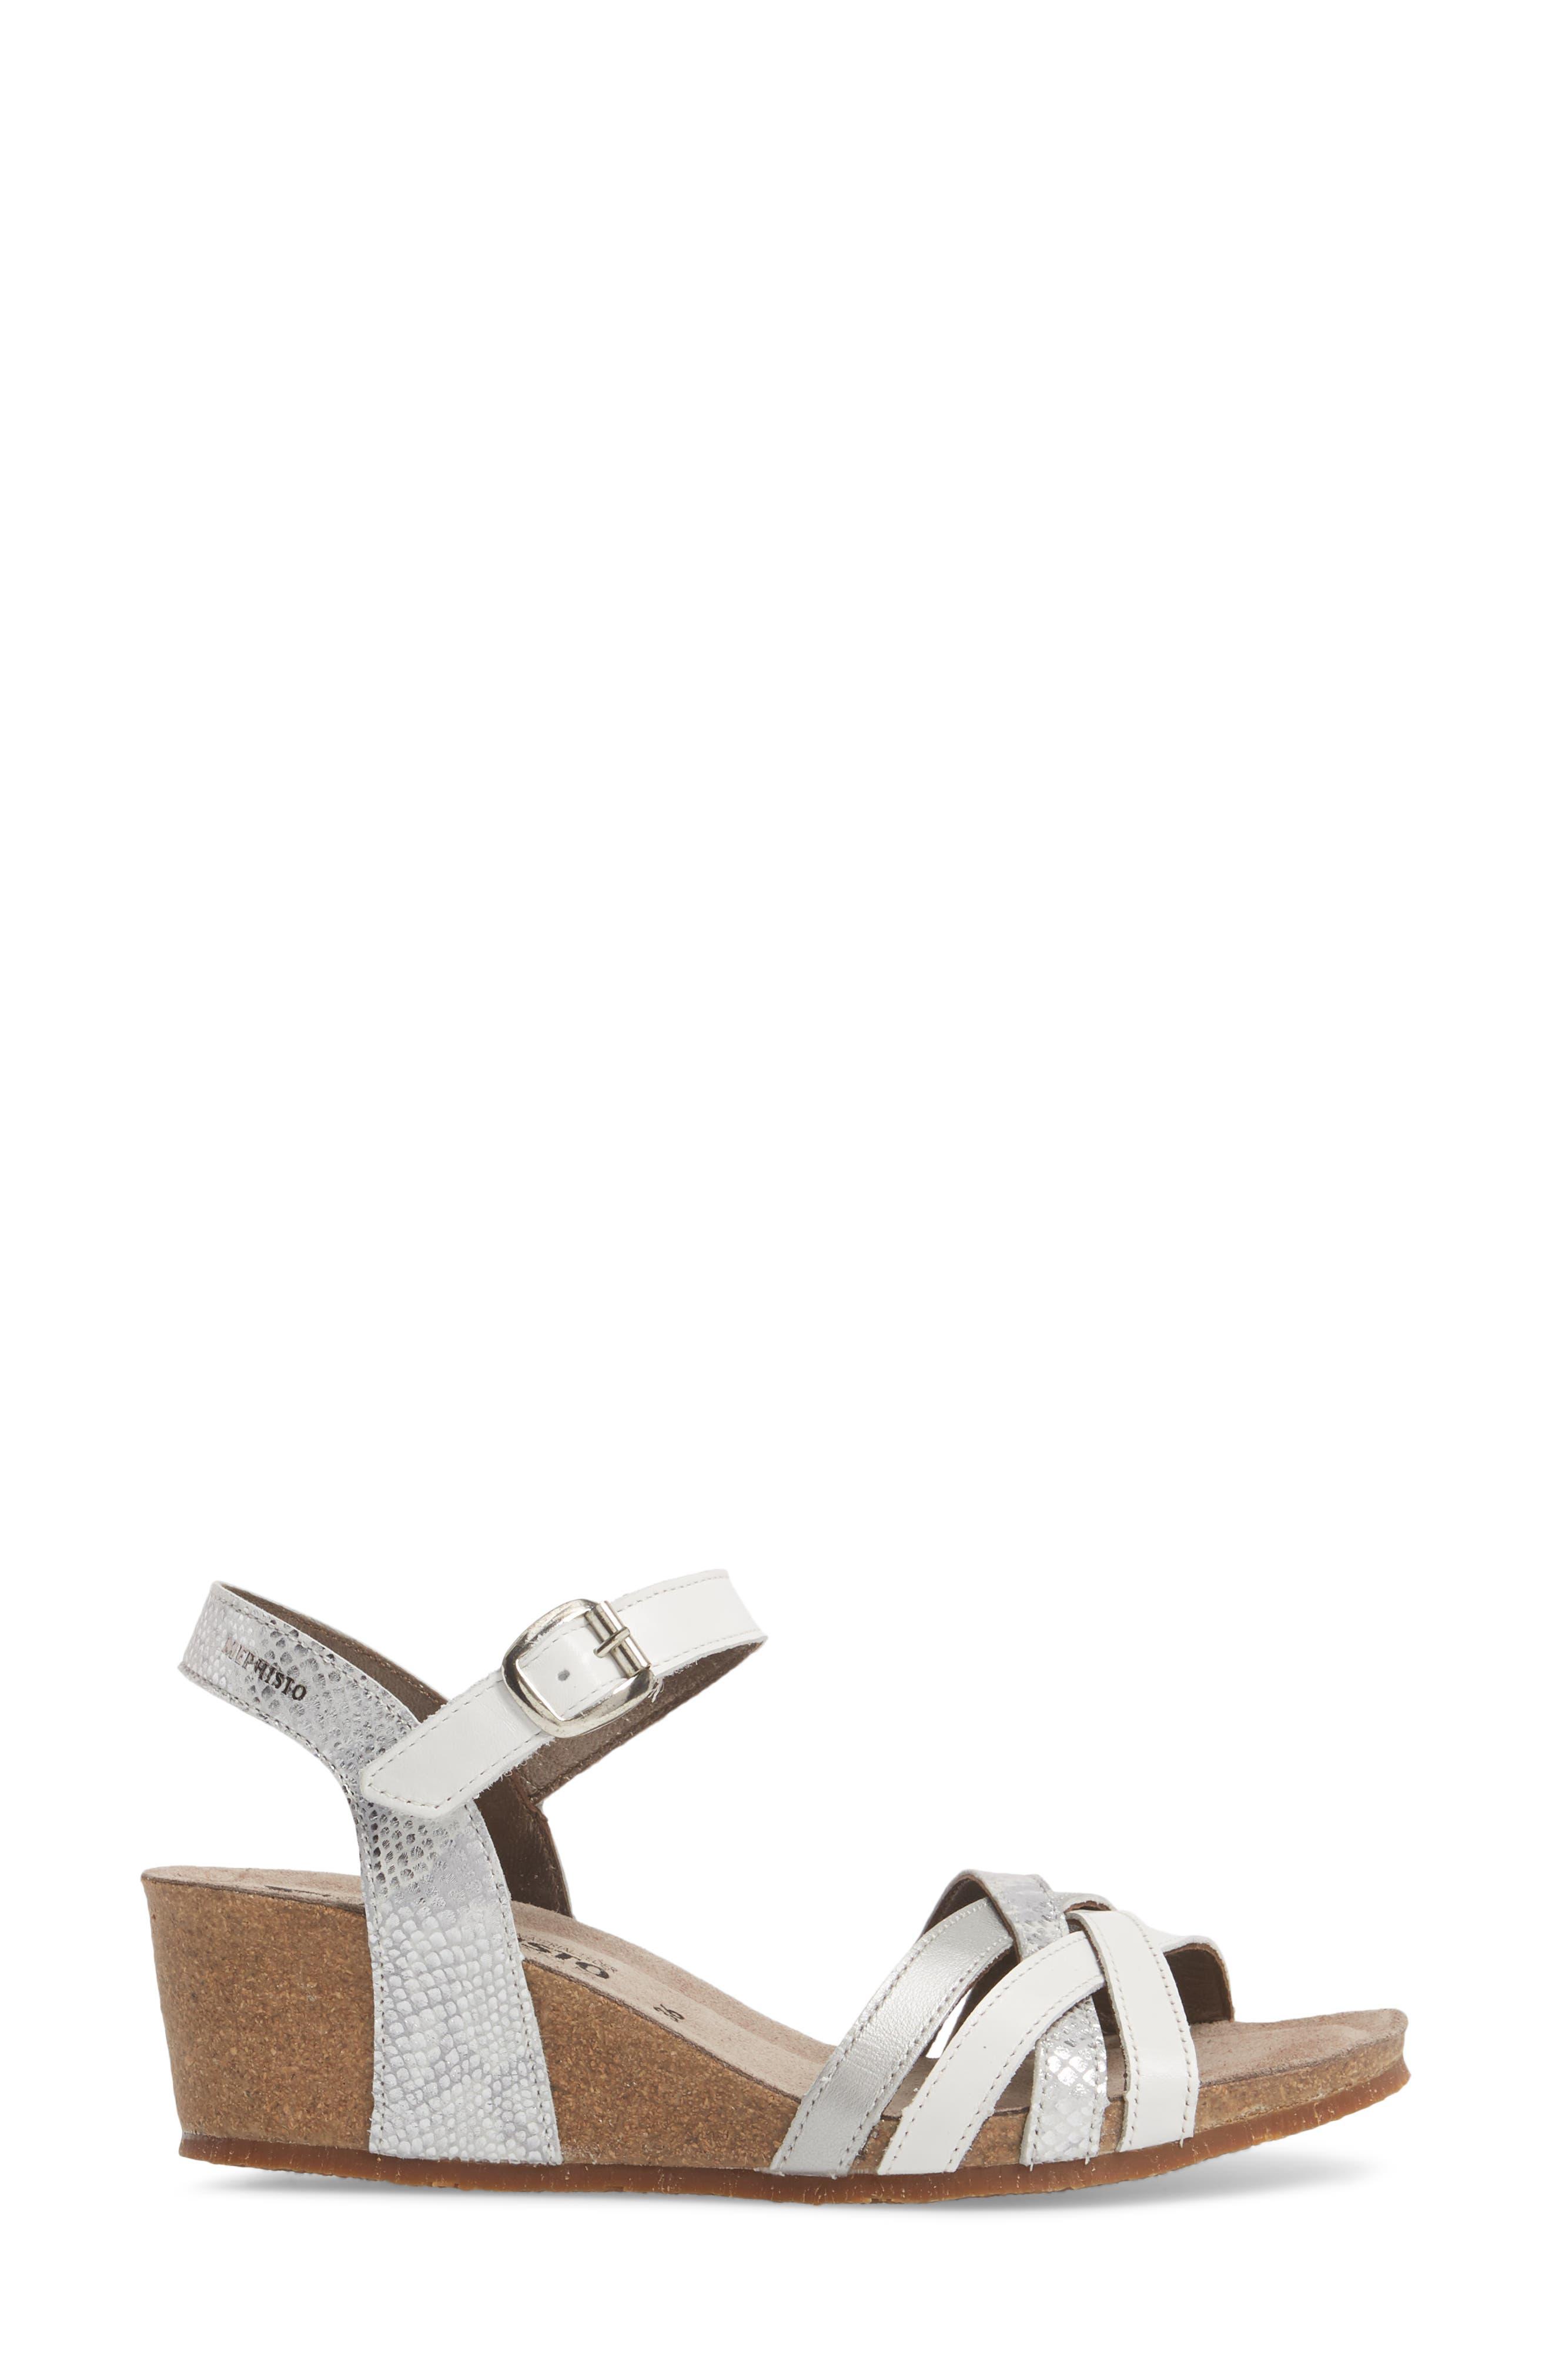 Mado Wedge Sandal,                             Alternate thumbnail 3, color,                             White Leather